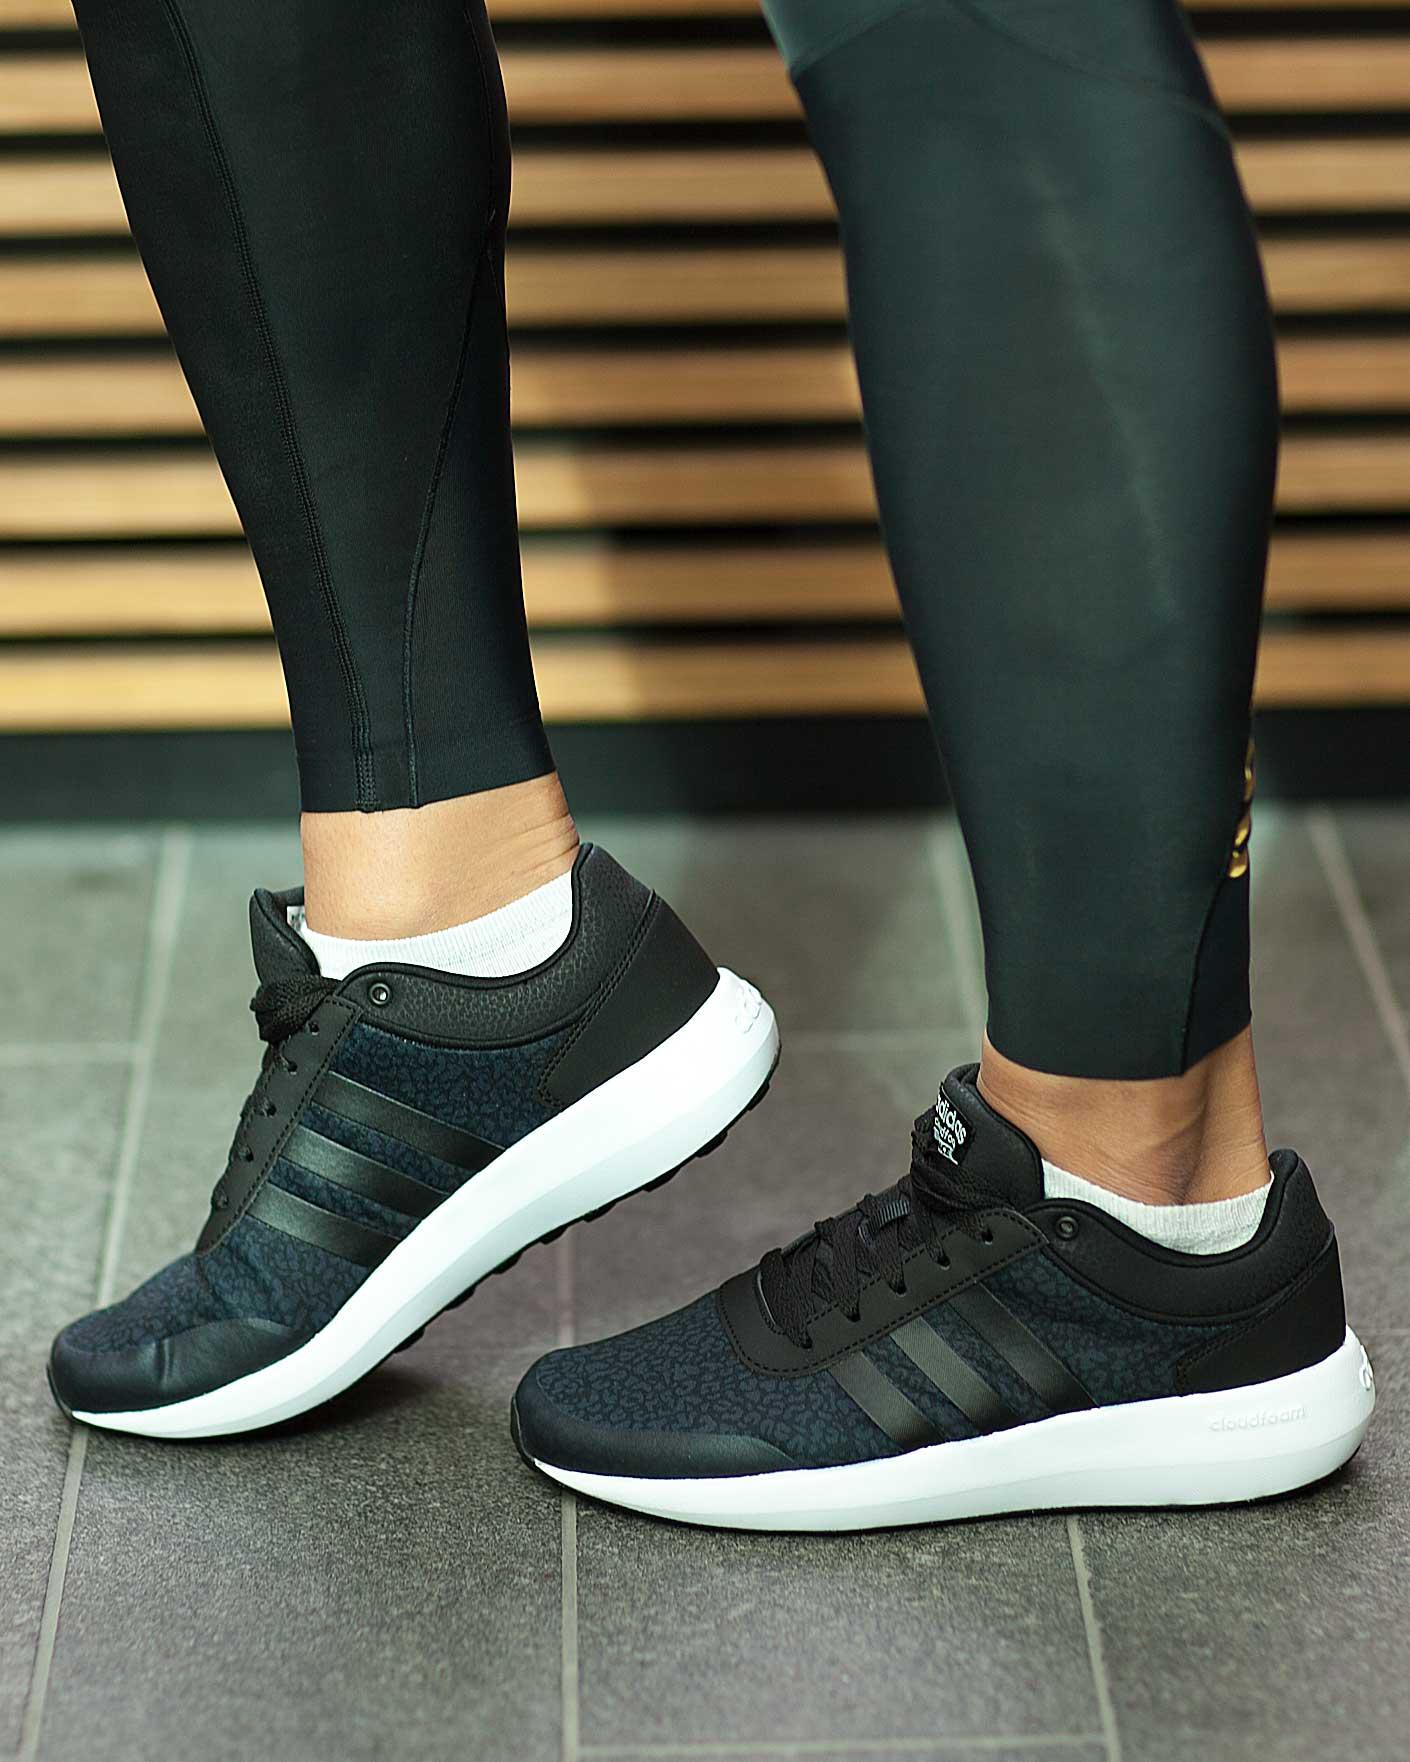 Korn Adidas Shoes